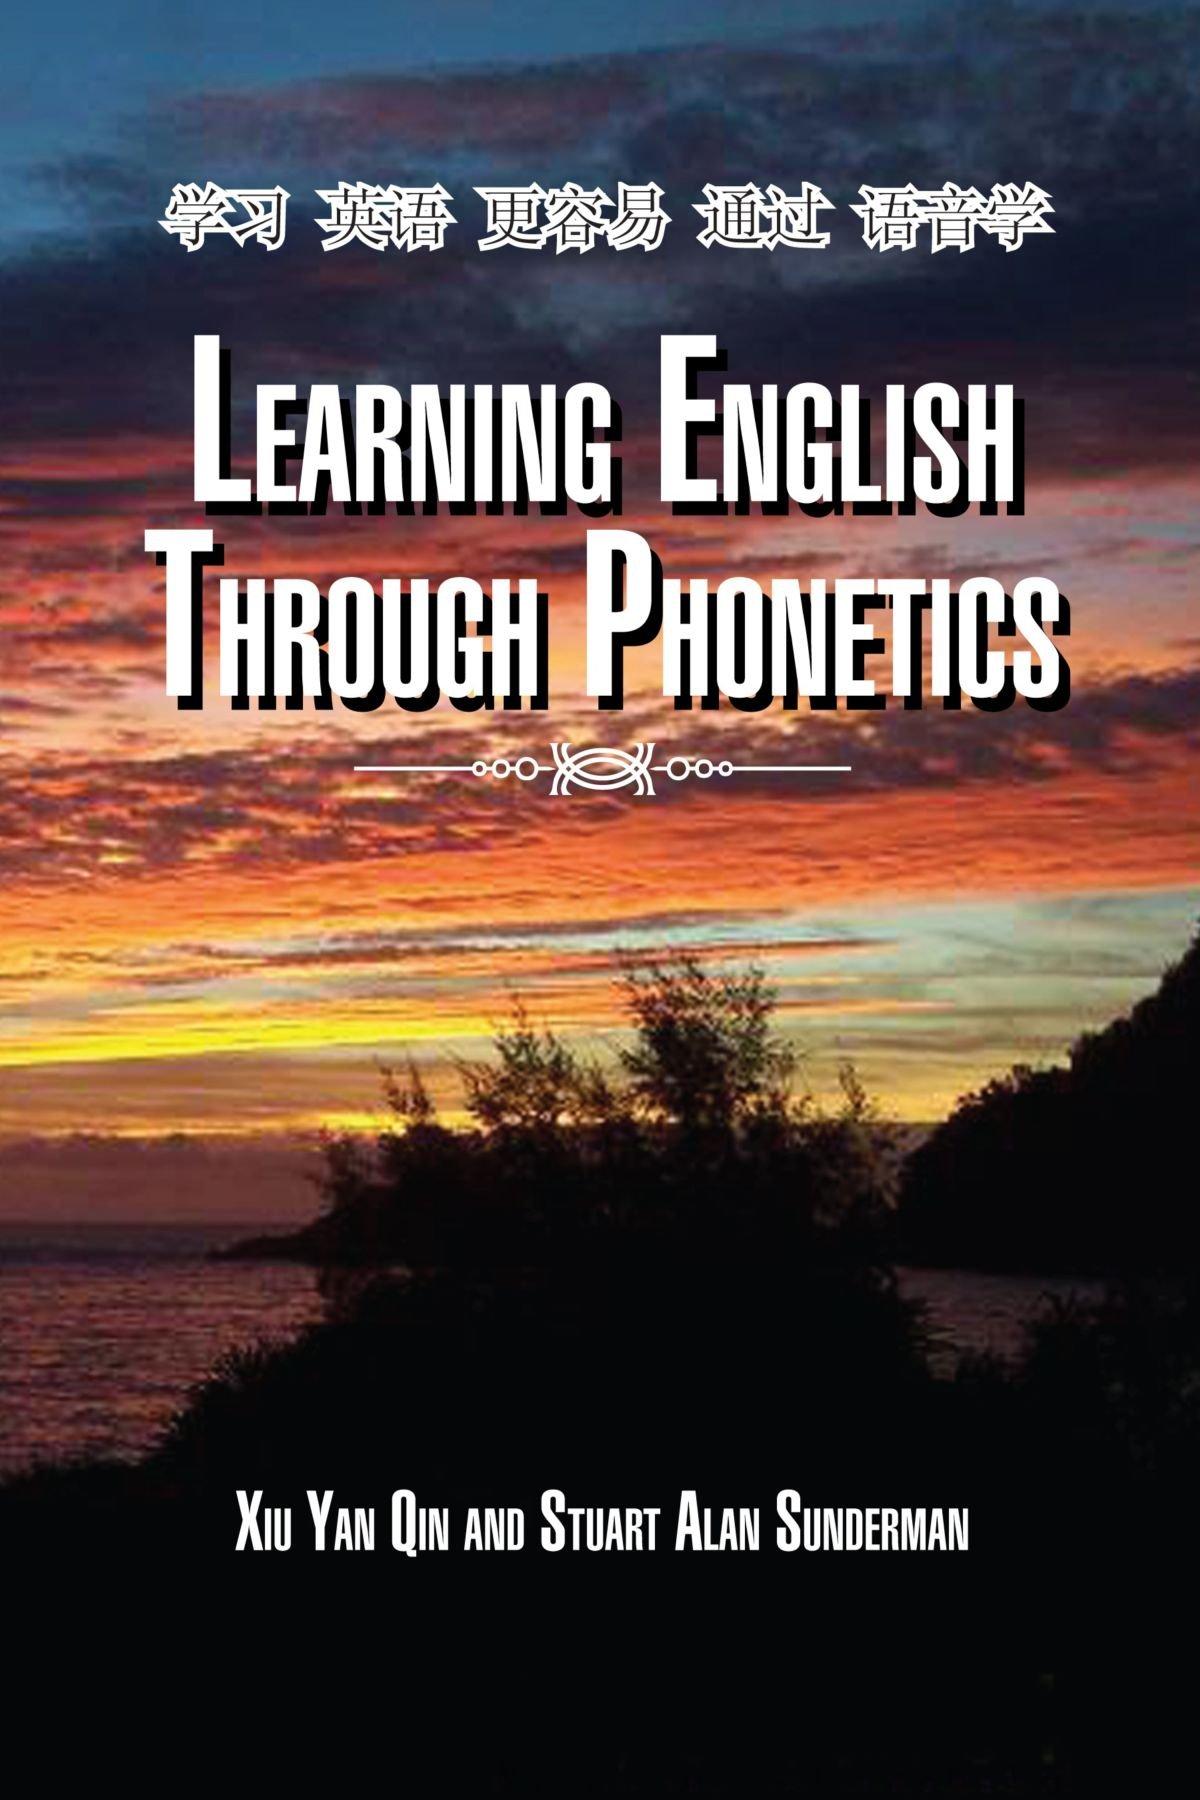 Download Learning English Through Phonetics (Multilingual Edition) PDF